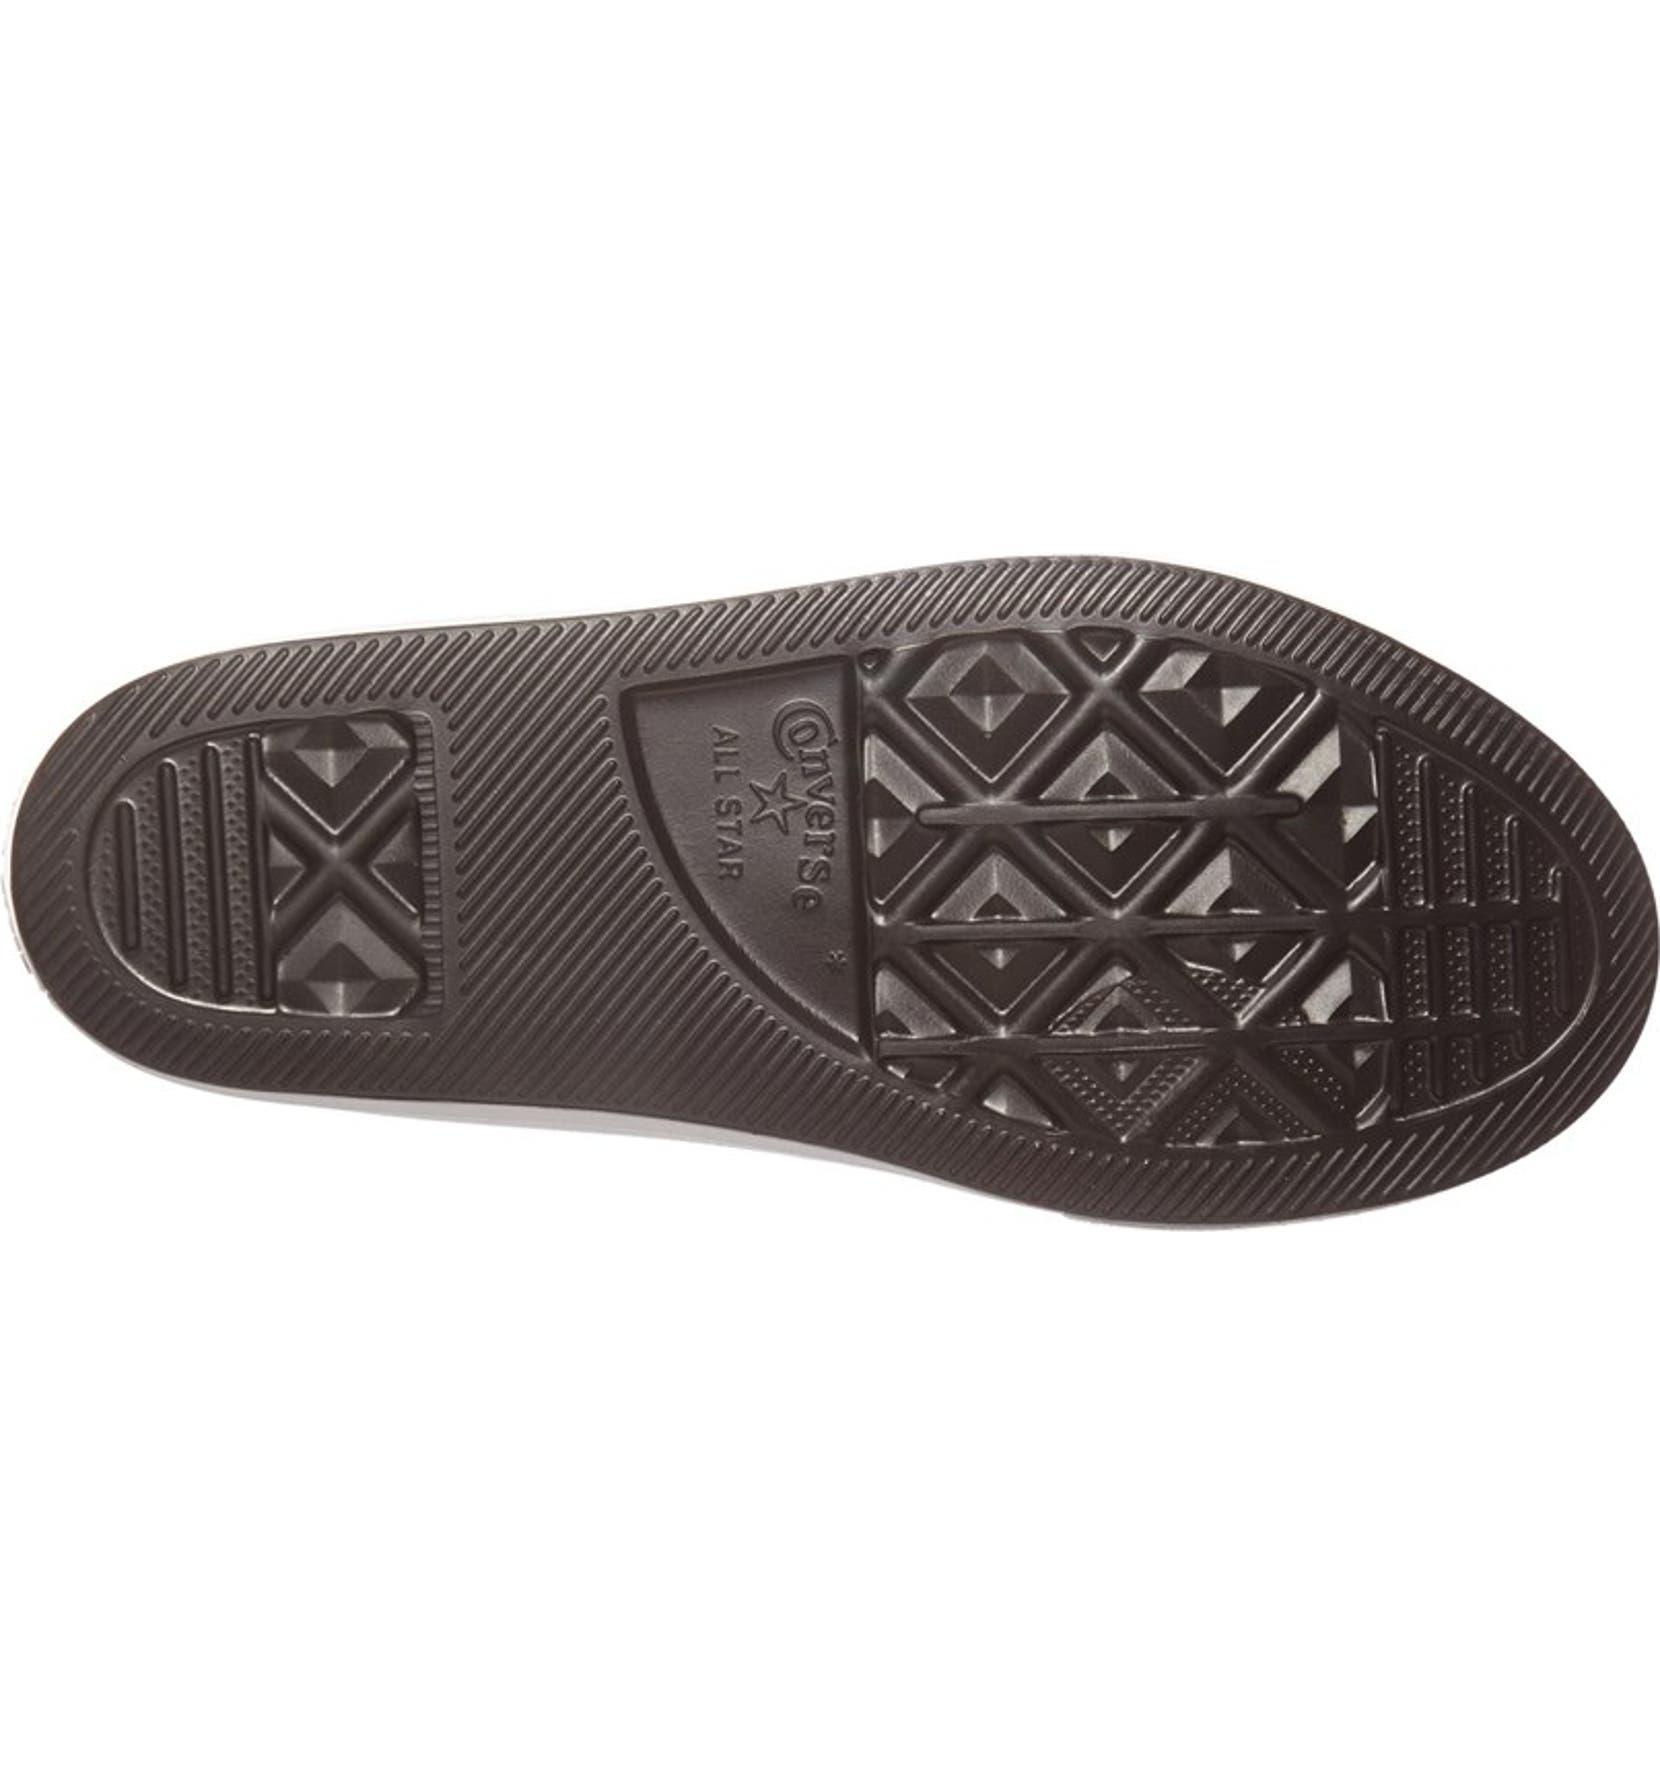 4de30731f73fec Converse Chuck Taylor® All Star®  Rockaway Perforated Slip-On (Toddler